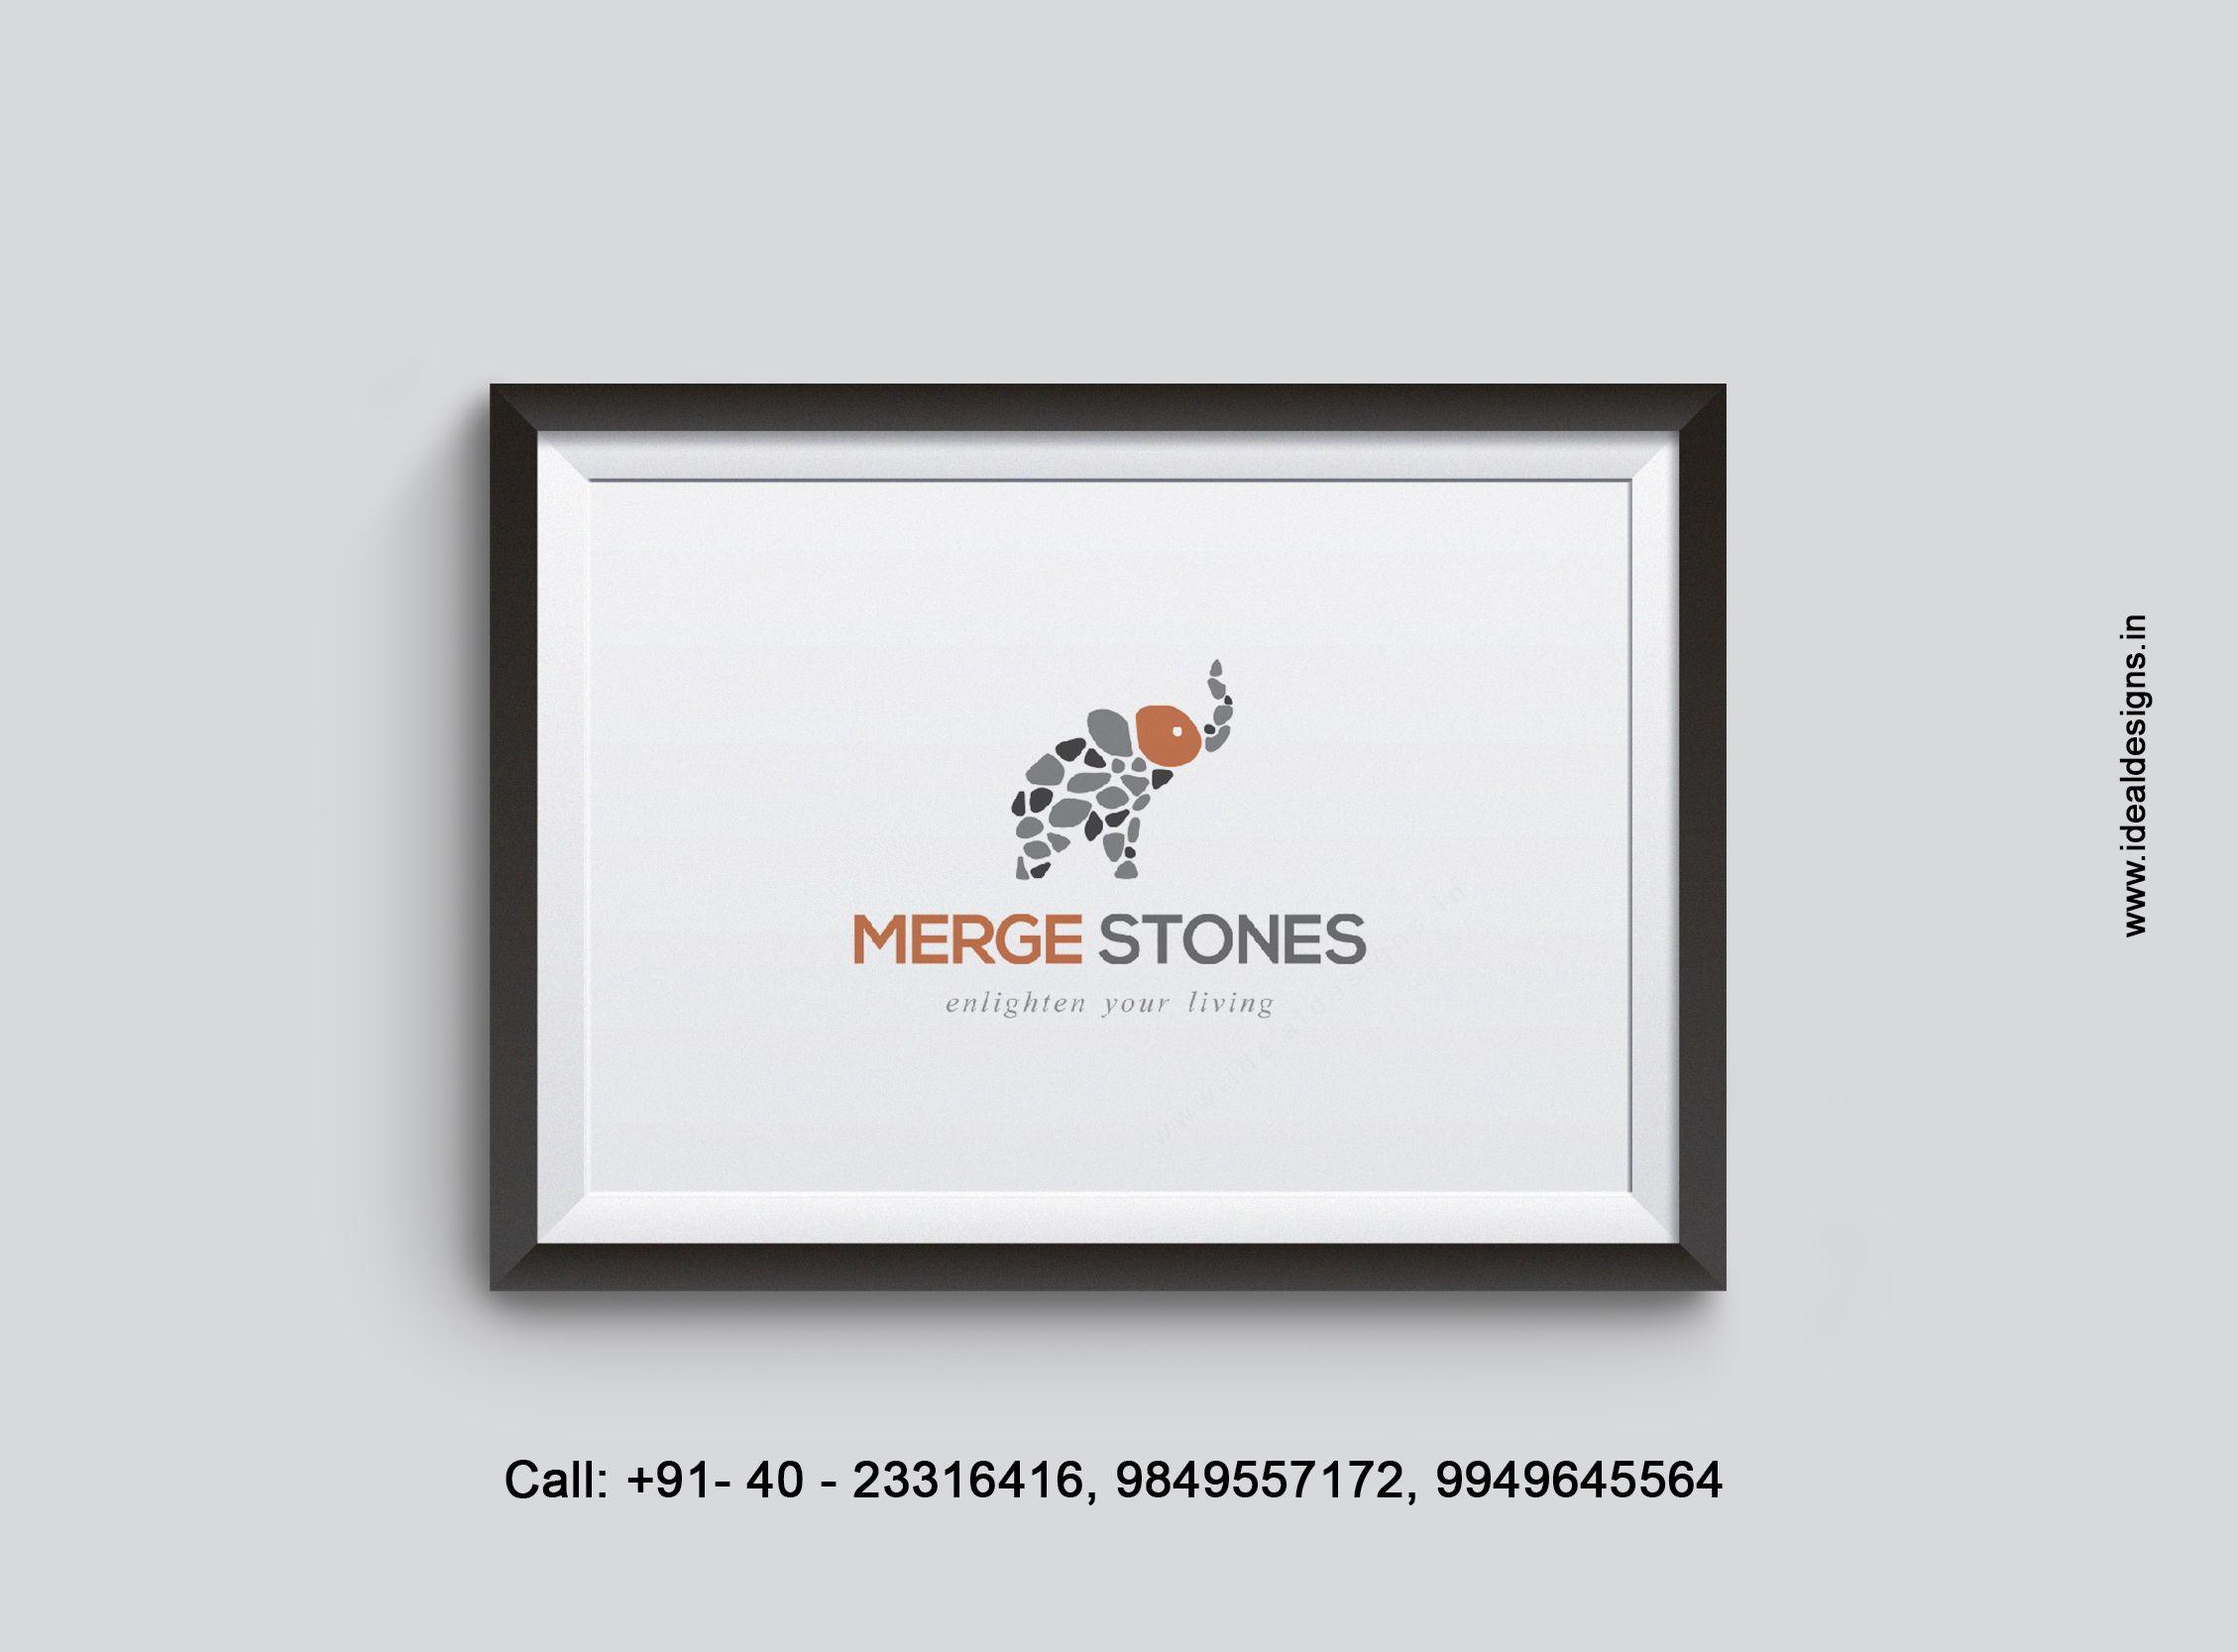 Granites Logo Design Hyderabad India Granite Marble Logo Design India Granites Company Logo Design India Logo Design Company Logo Design Granite Company